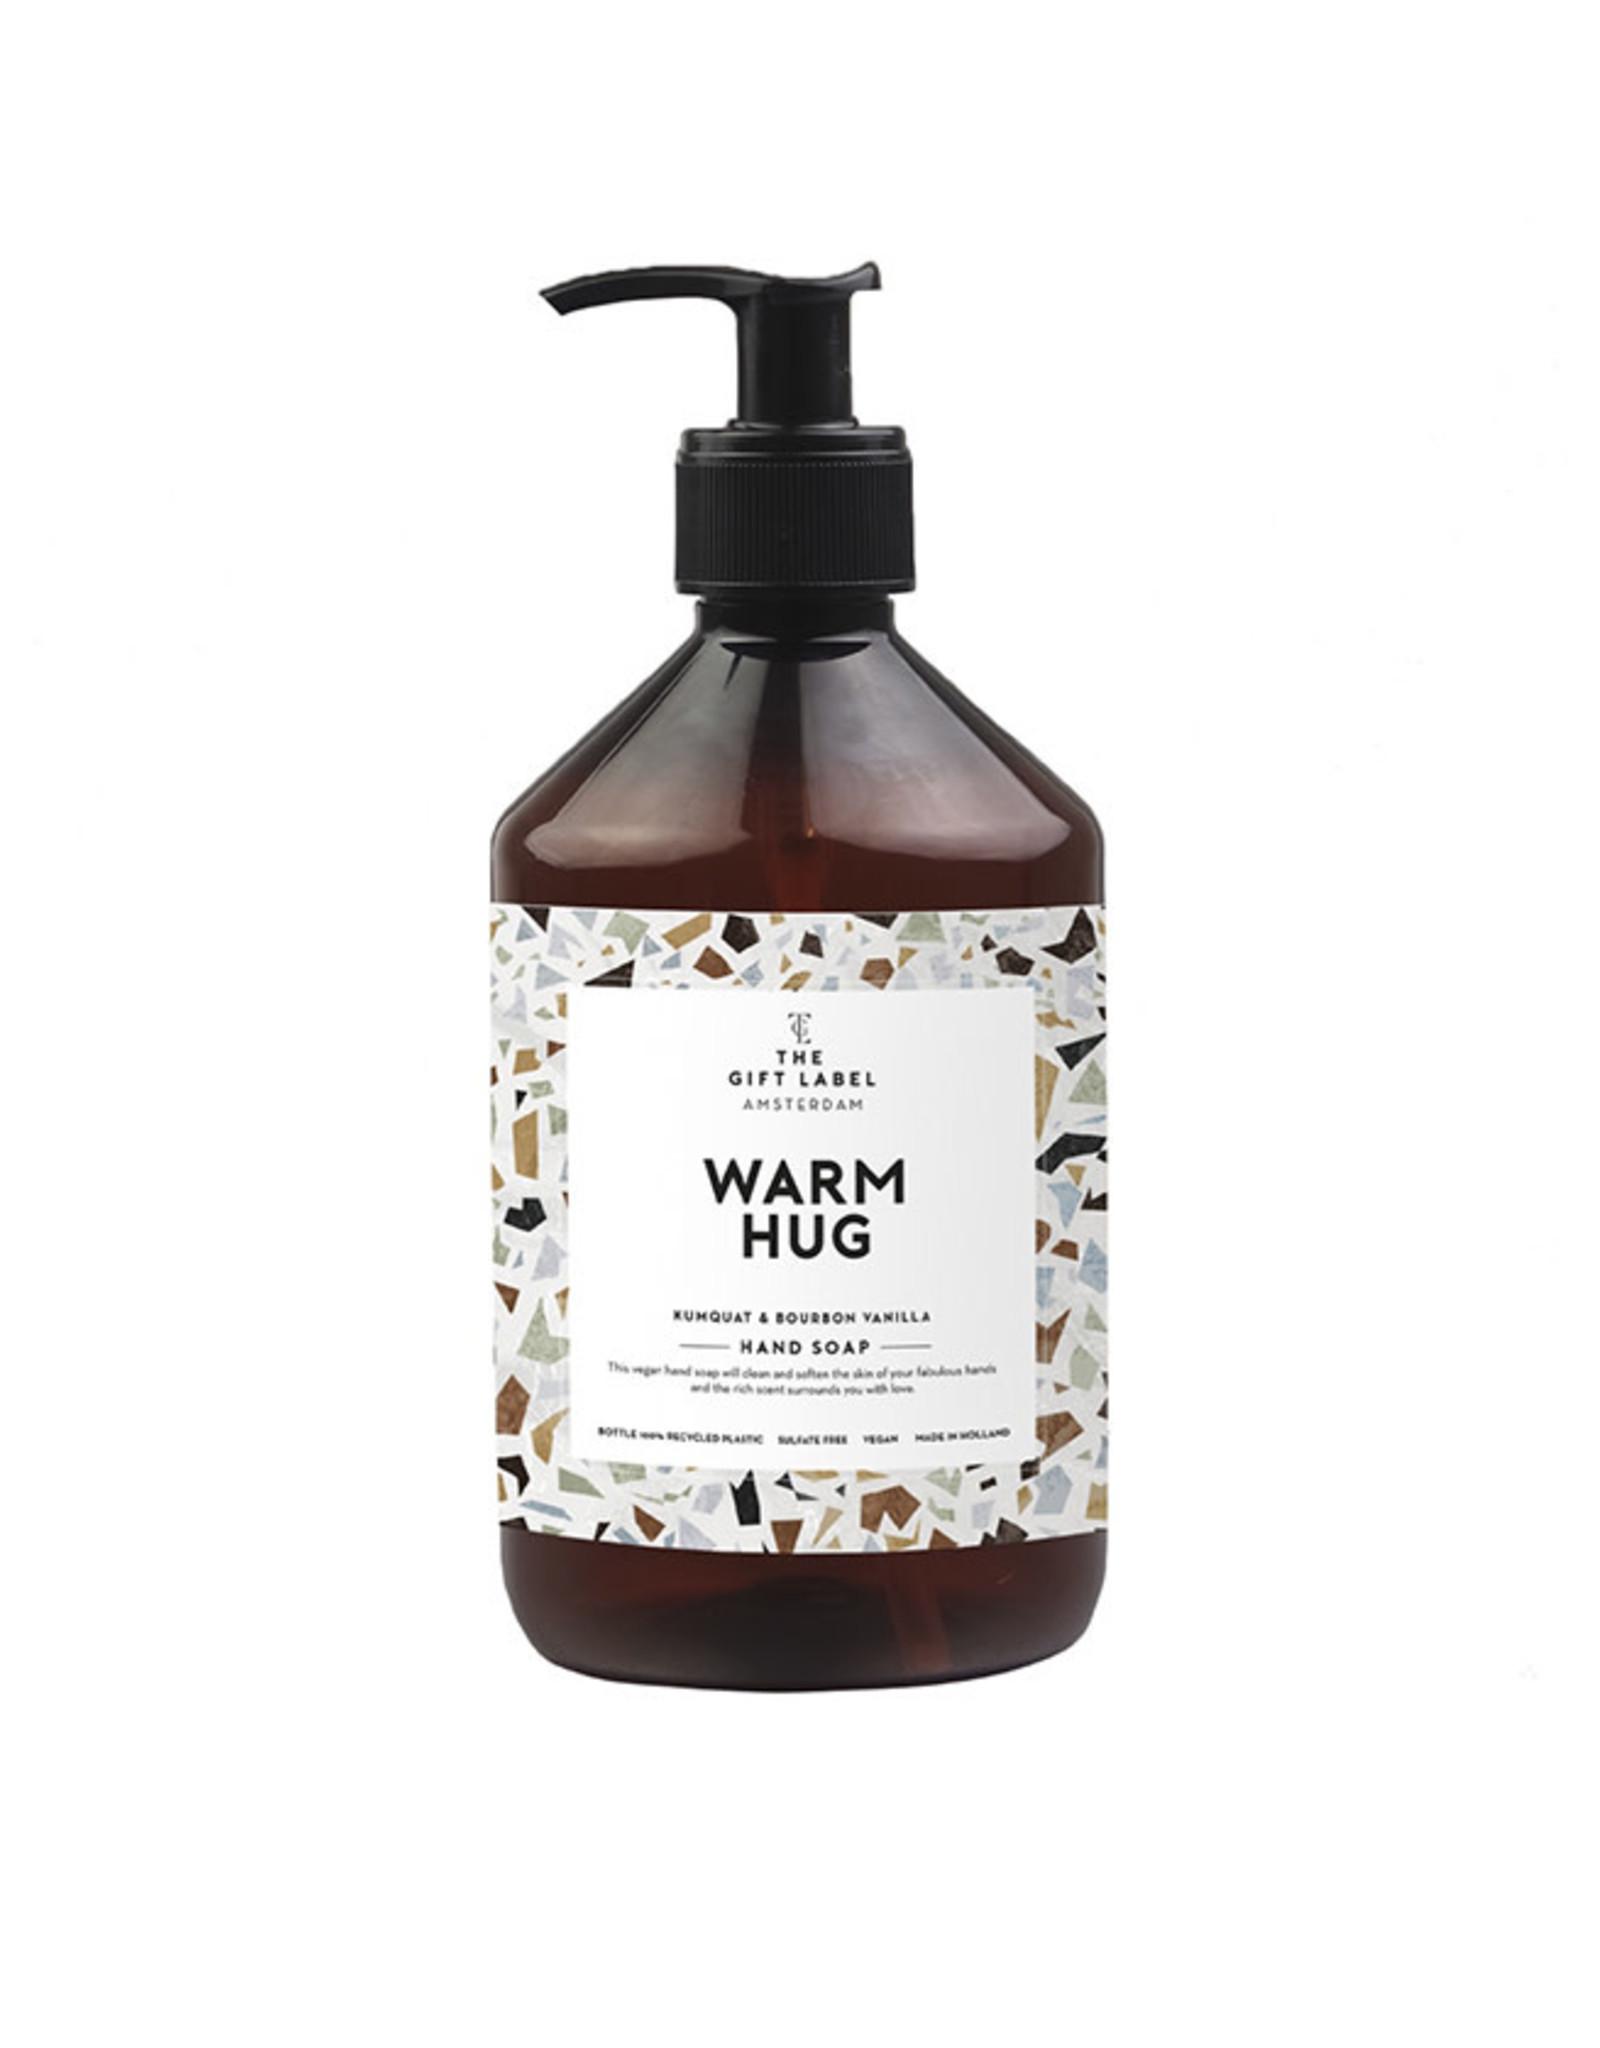 The Gift Label Handzeep-Warm hug